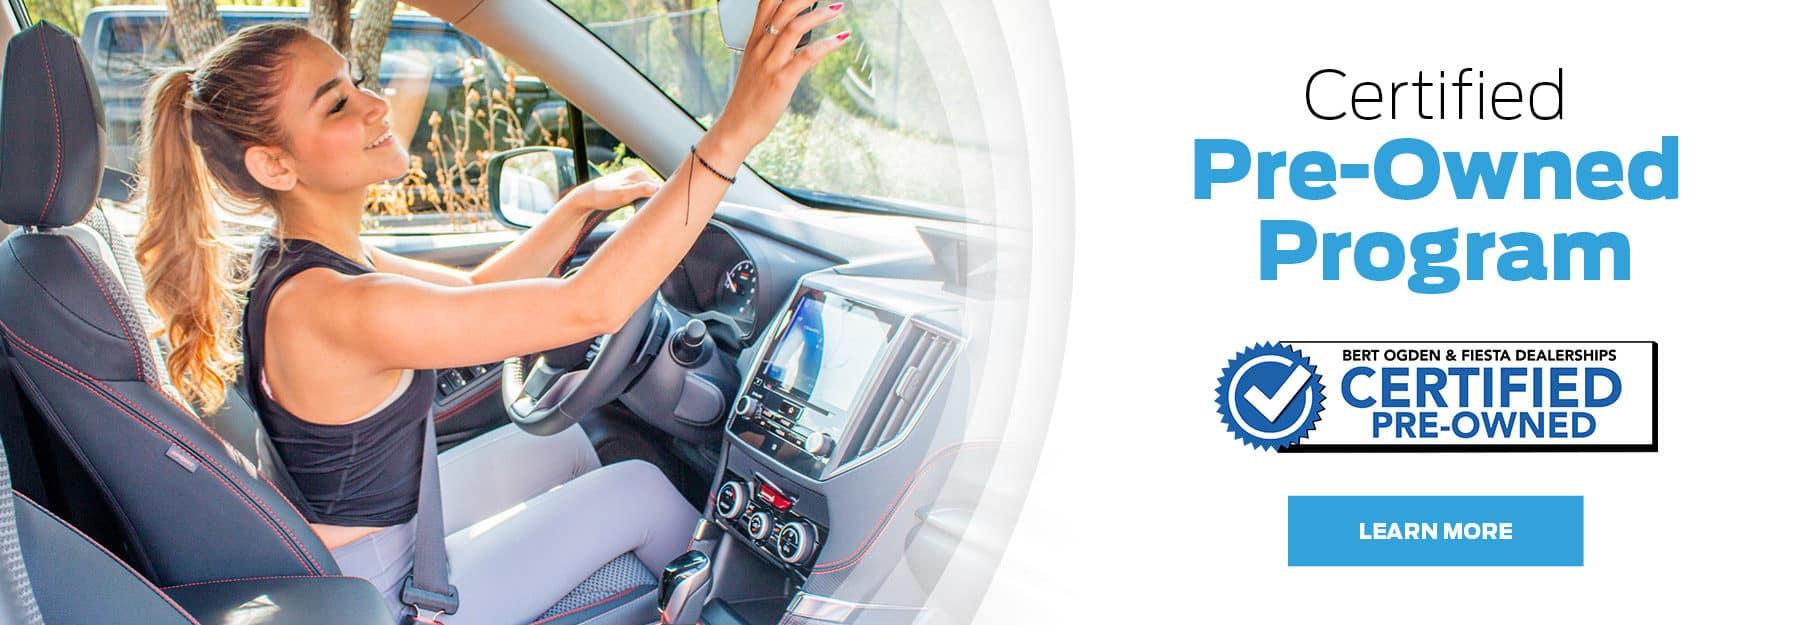 Certified Pre-Owned Program - Bert Ogden Hyundai in Harlingen, Texas